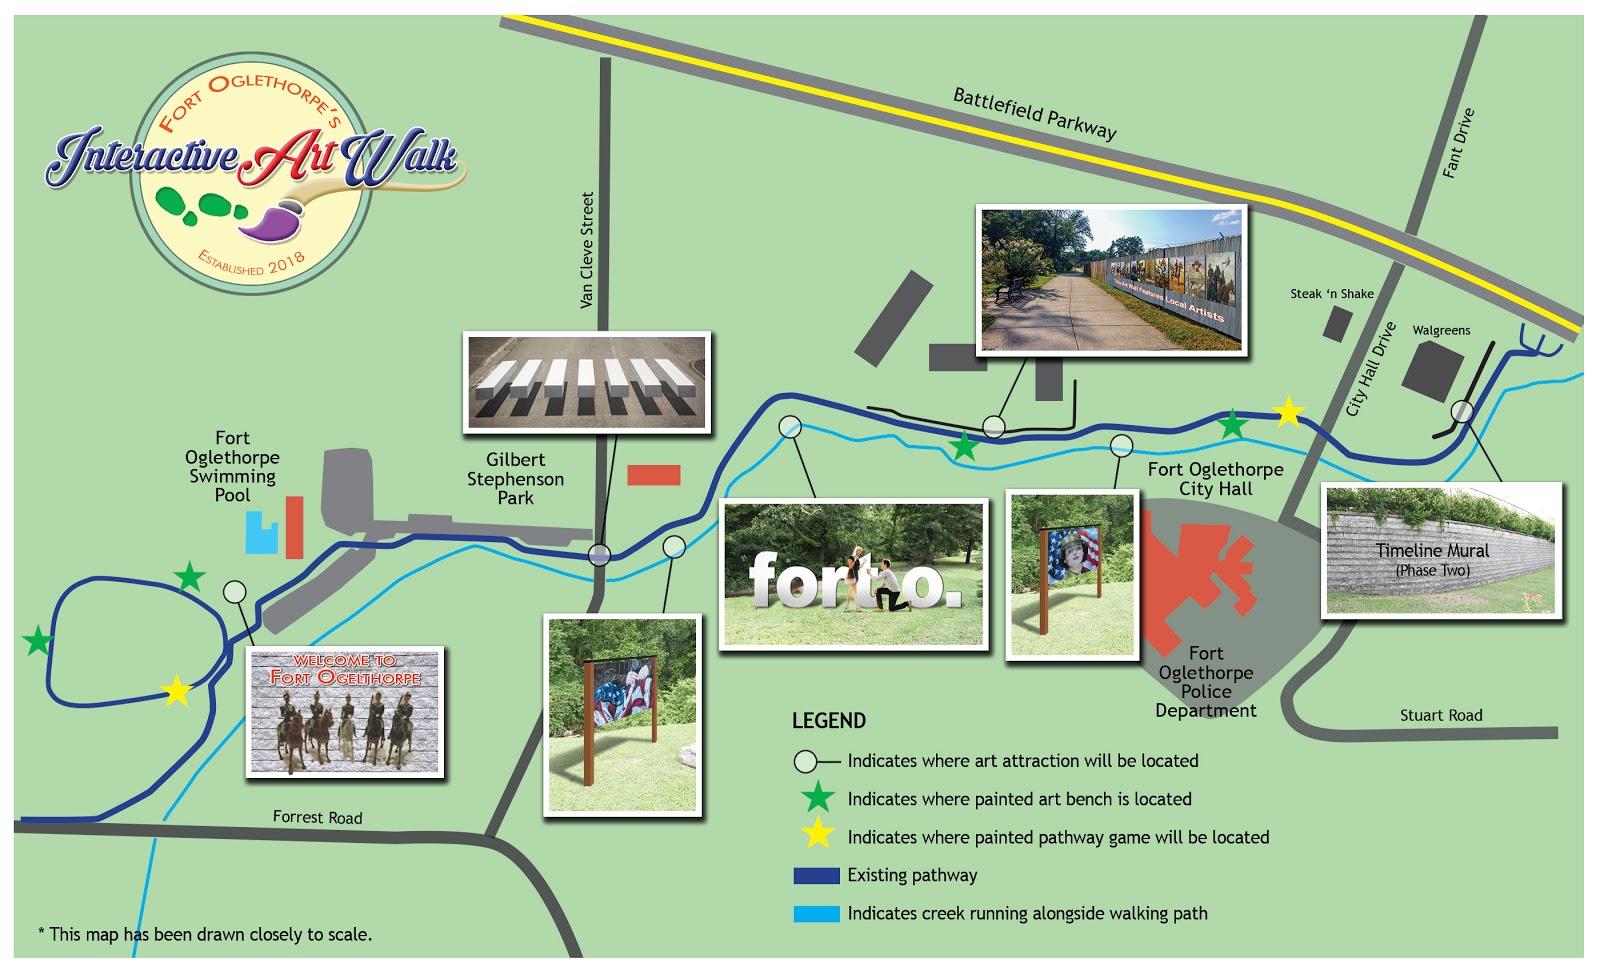 A rendering of Fort Oglethorpe's Interactive Art Walk, coming summer of 2019.